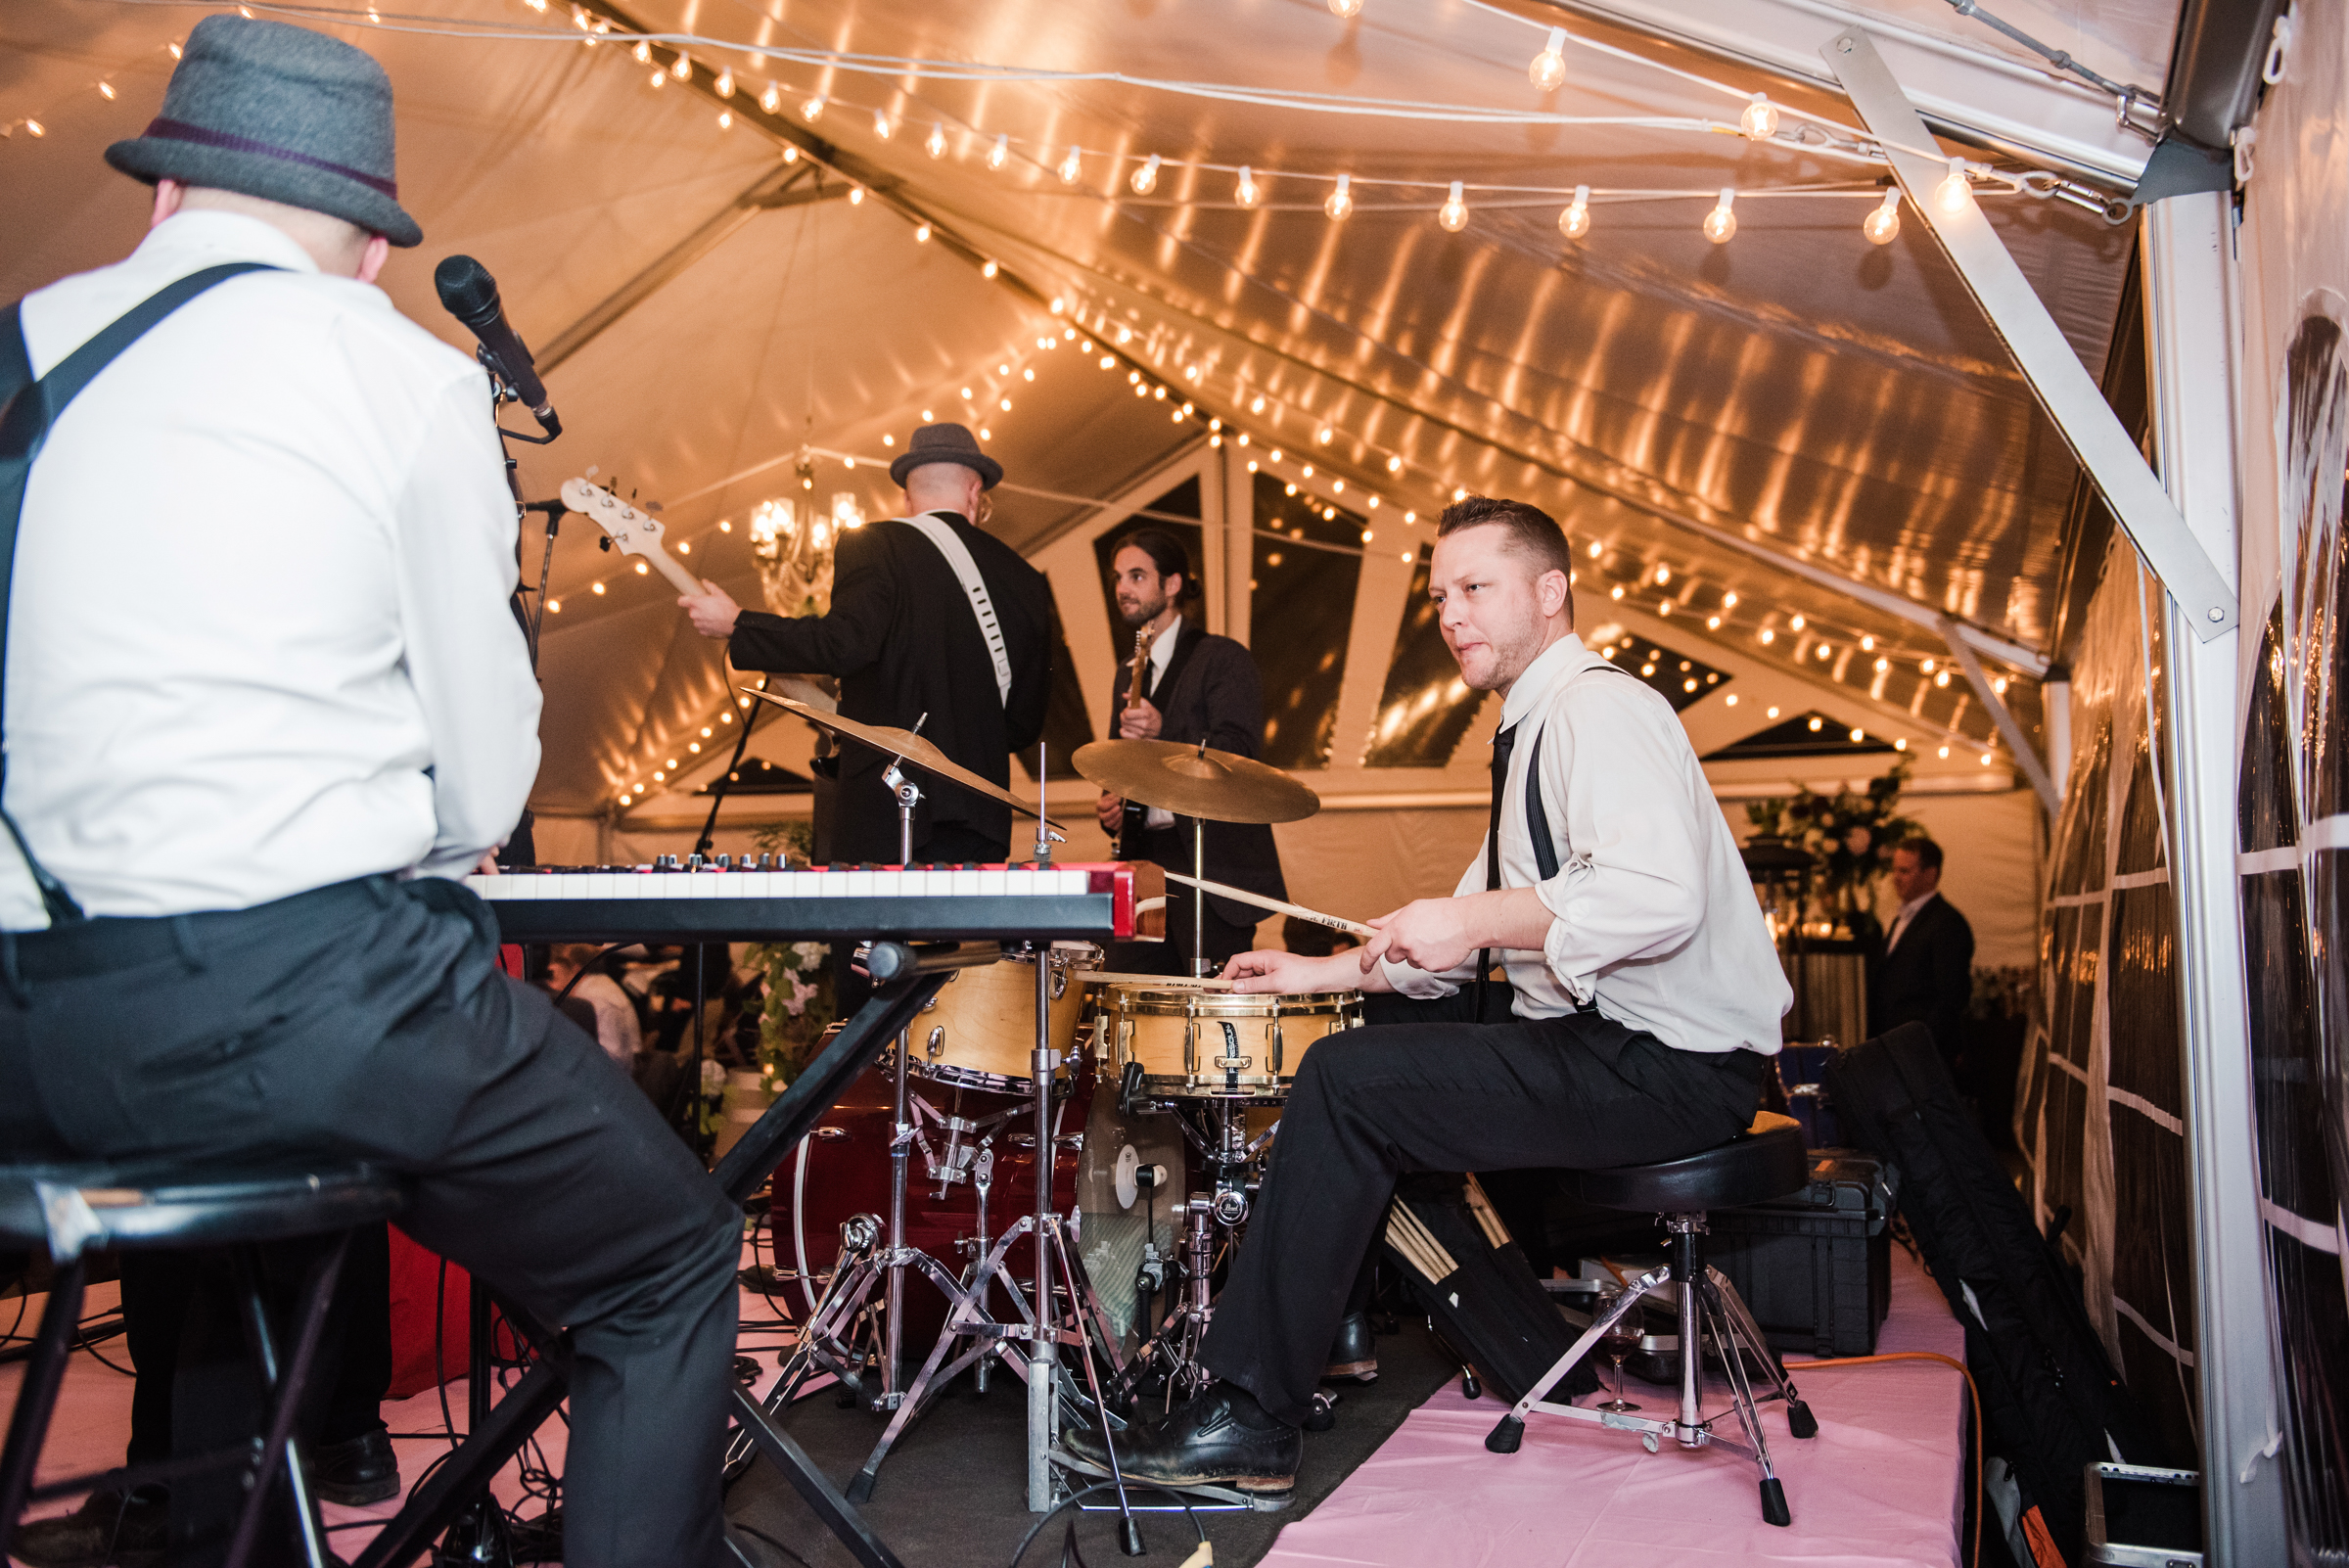 Zugibe_Vineyards_Finger_Lakes_Wedding_JILL_STUDIO_Rochester_NY_Photographer_DSC_4382.jpg